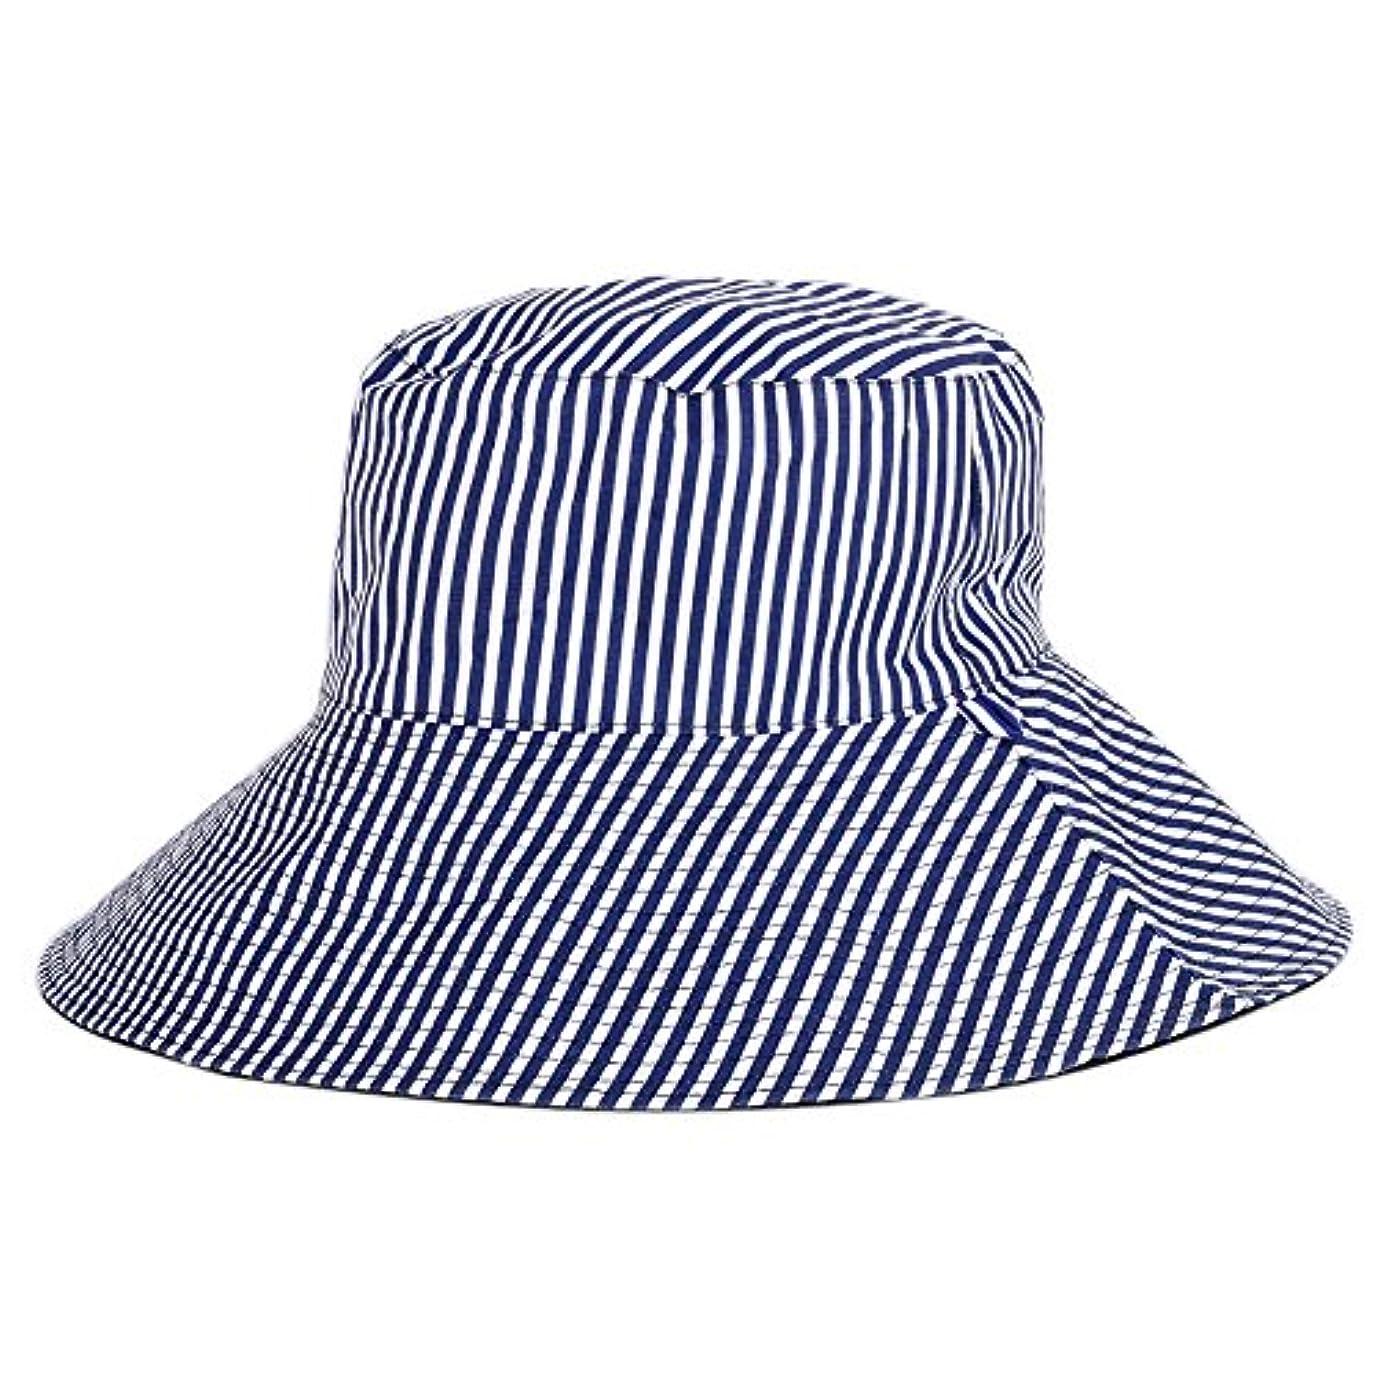 Moresave女性用 レディース 春夏秋 つば広 ハット UVカット帽子 ネックカバー 両面ども使え!